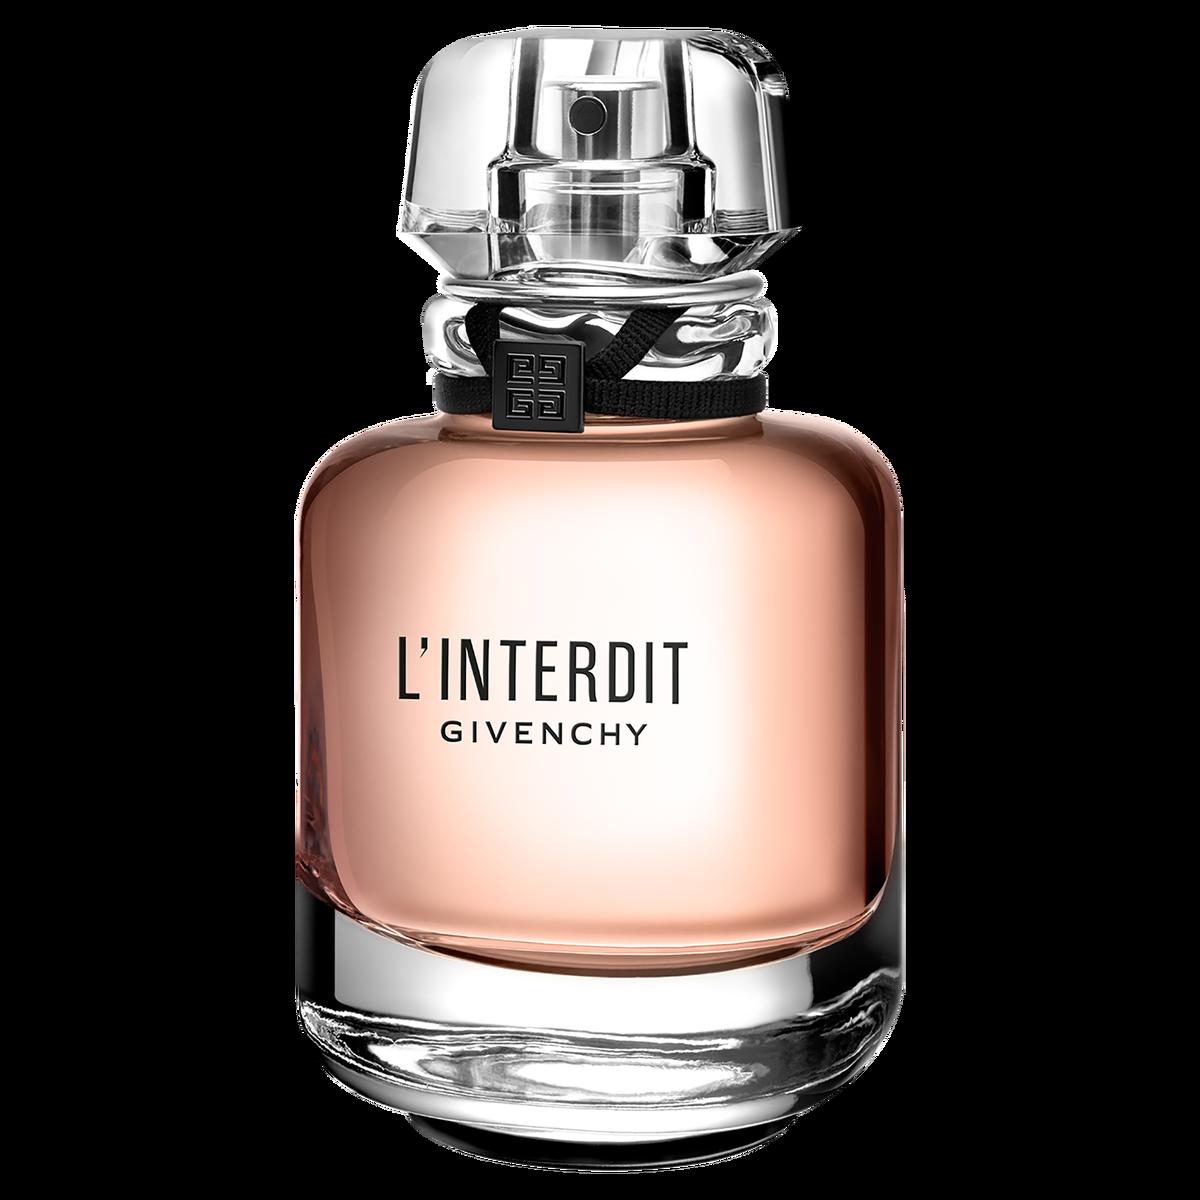 L'INTERDIT GIVENCHY P069002 | Perfume, Perfume chloe